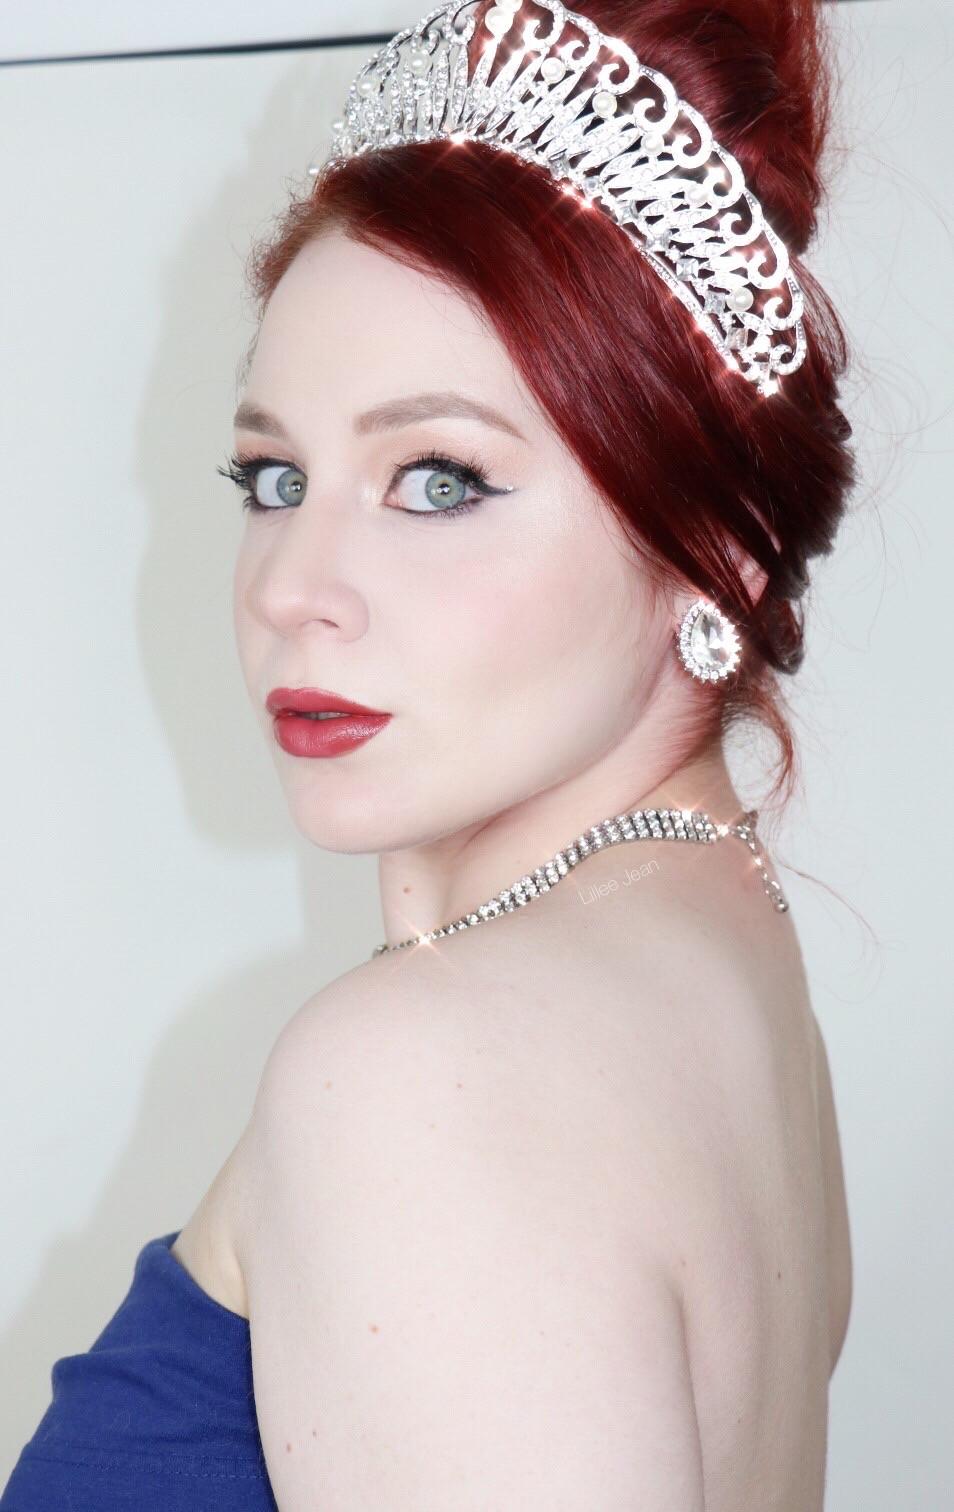 Princess ANASTASIA Essence Olá Rio Soft Glam Makeup Tutorial 2020   Lillee Jean